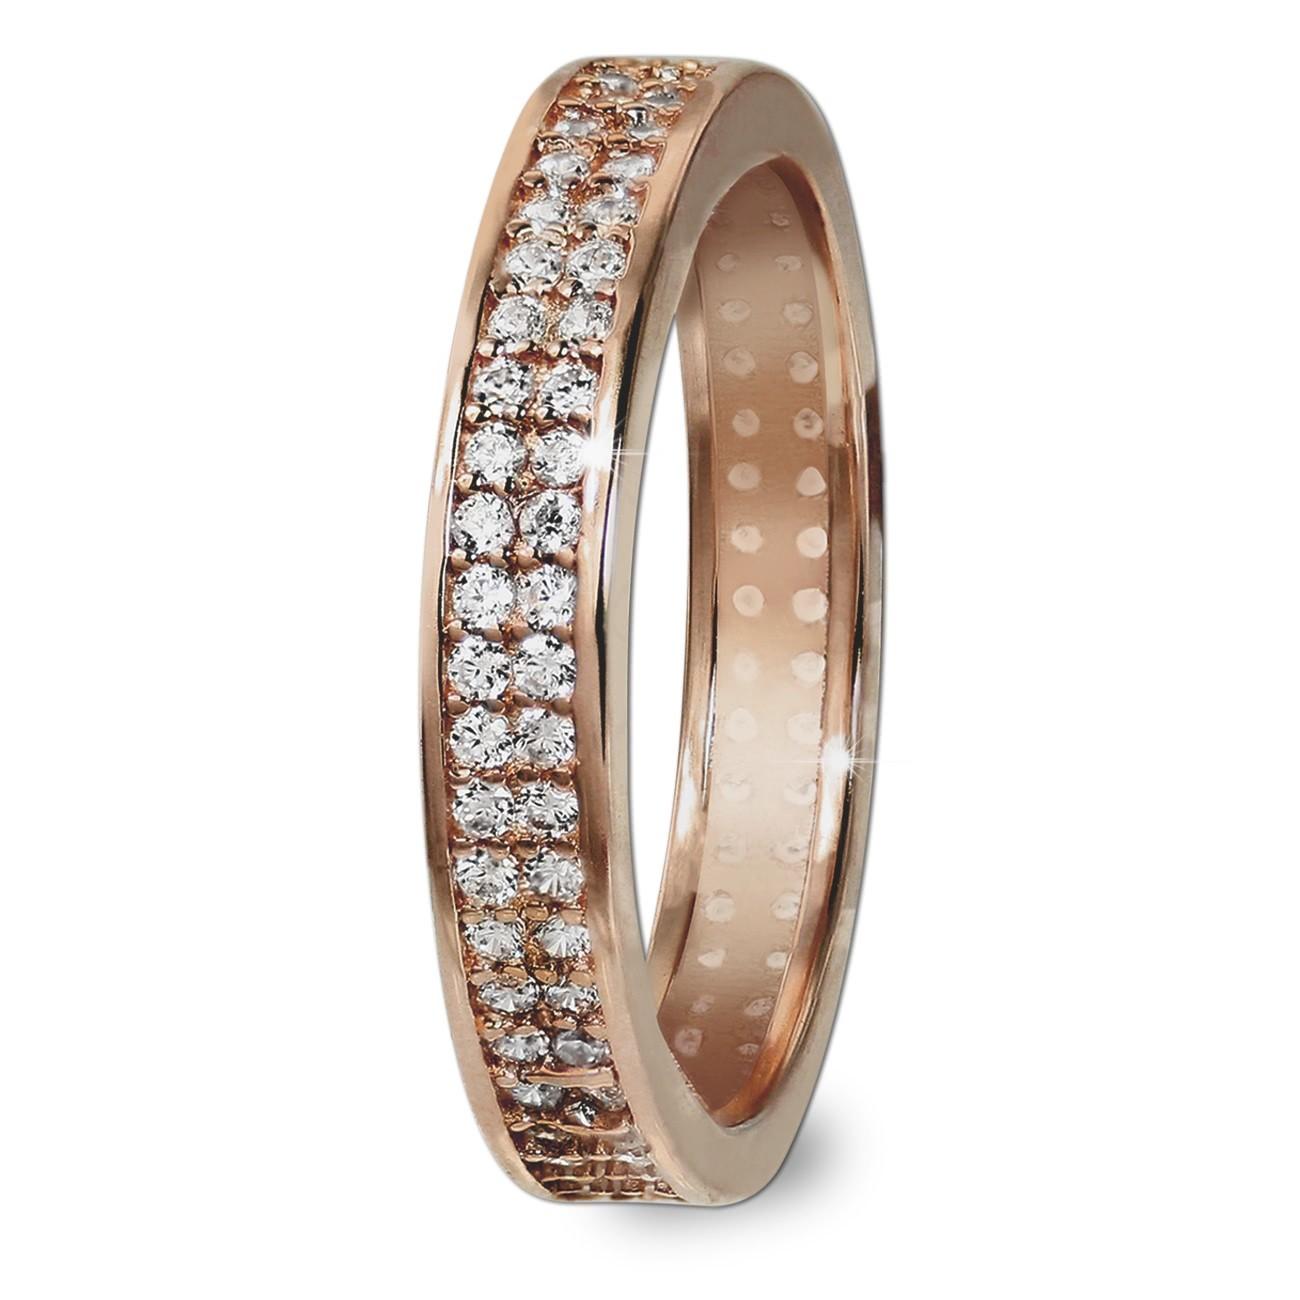 GoldDream Gold Ring Gr.56 Zirkonia weiß 333er Rosegold GDR514E56